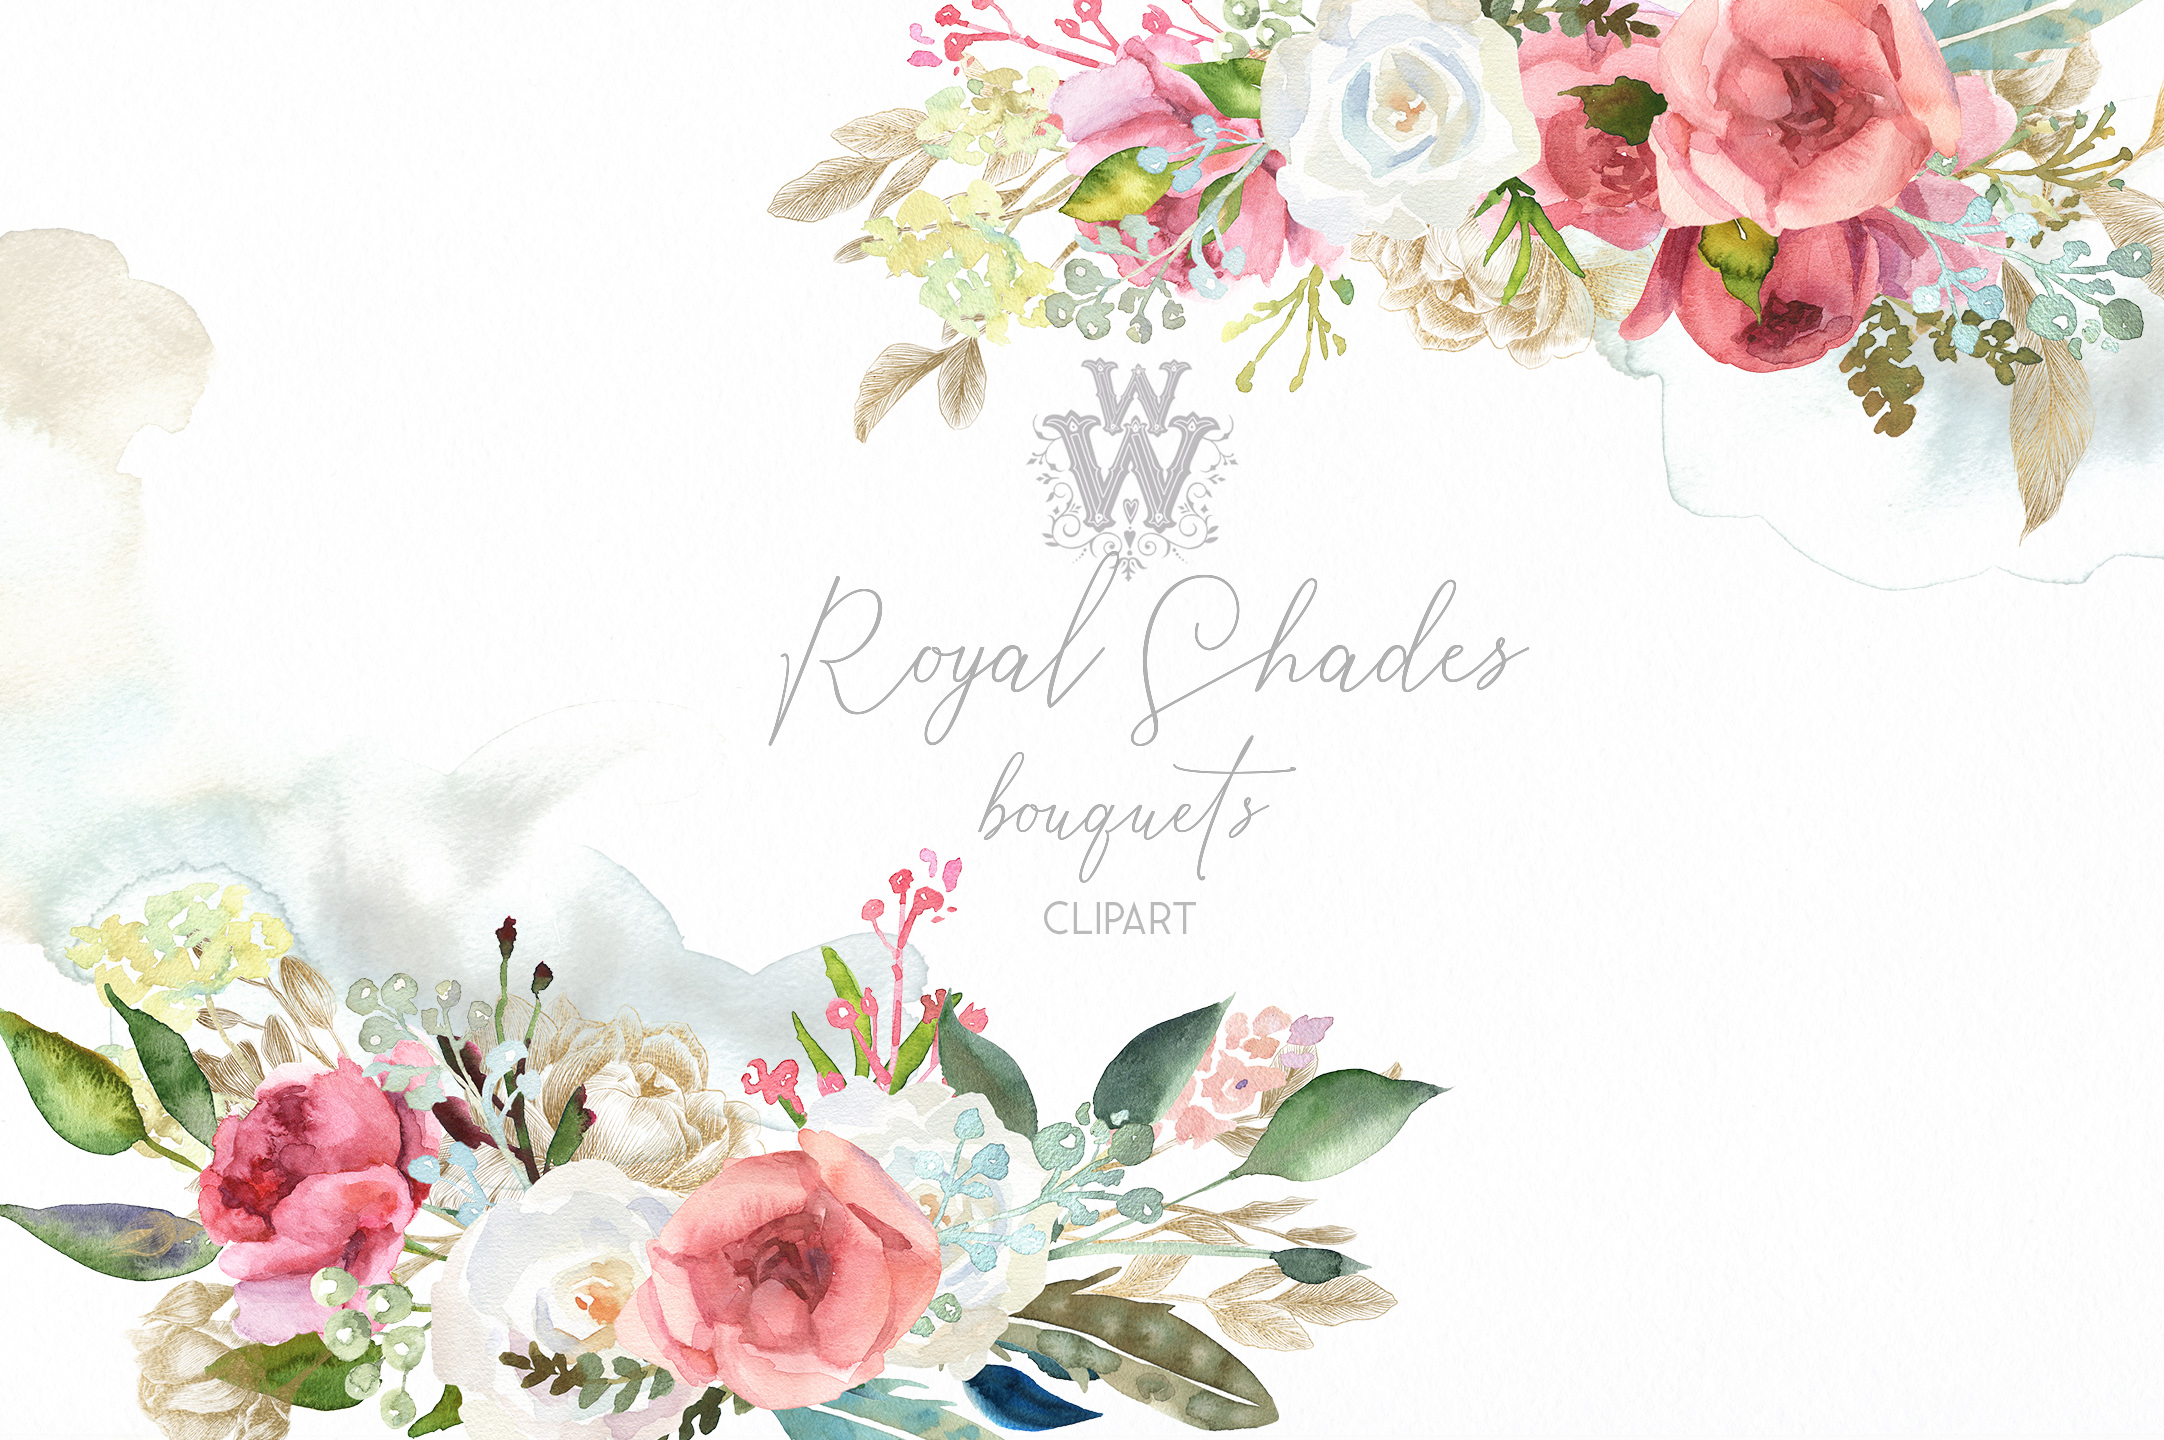 Watercolor rustic wedding bouquets clipart, vintage wreath ...